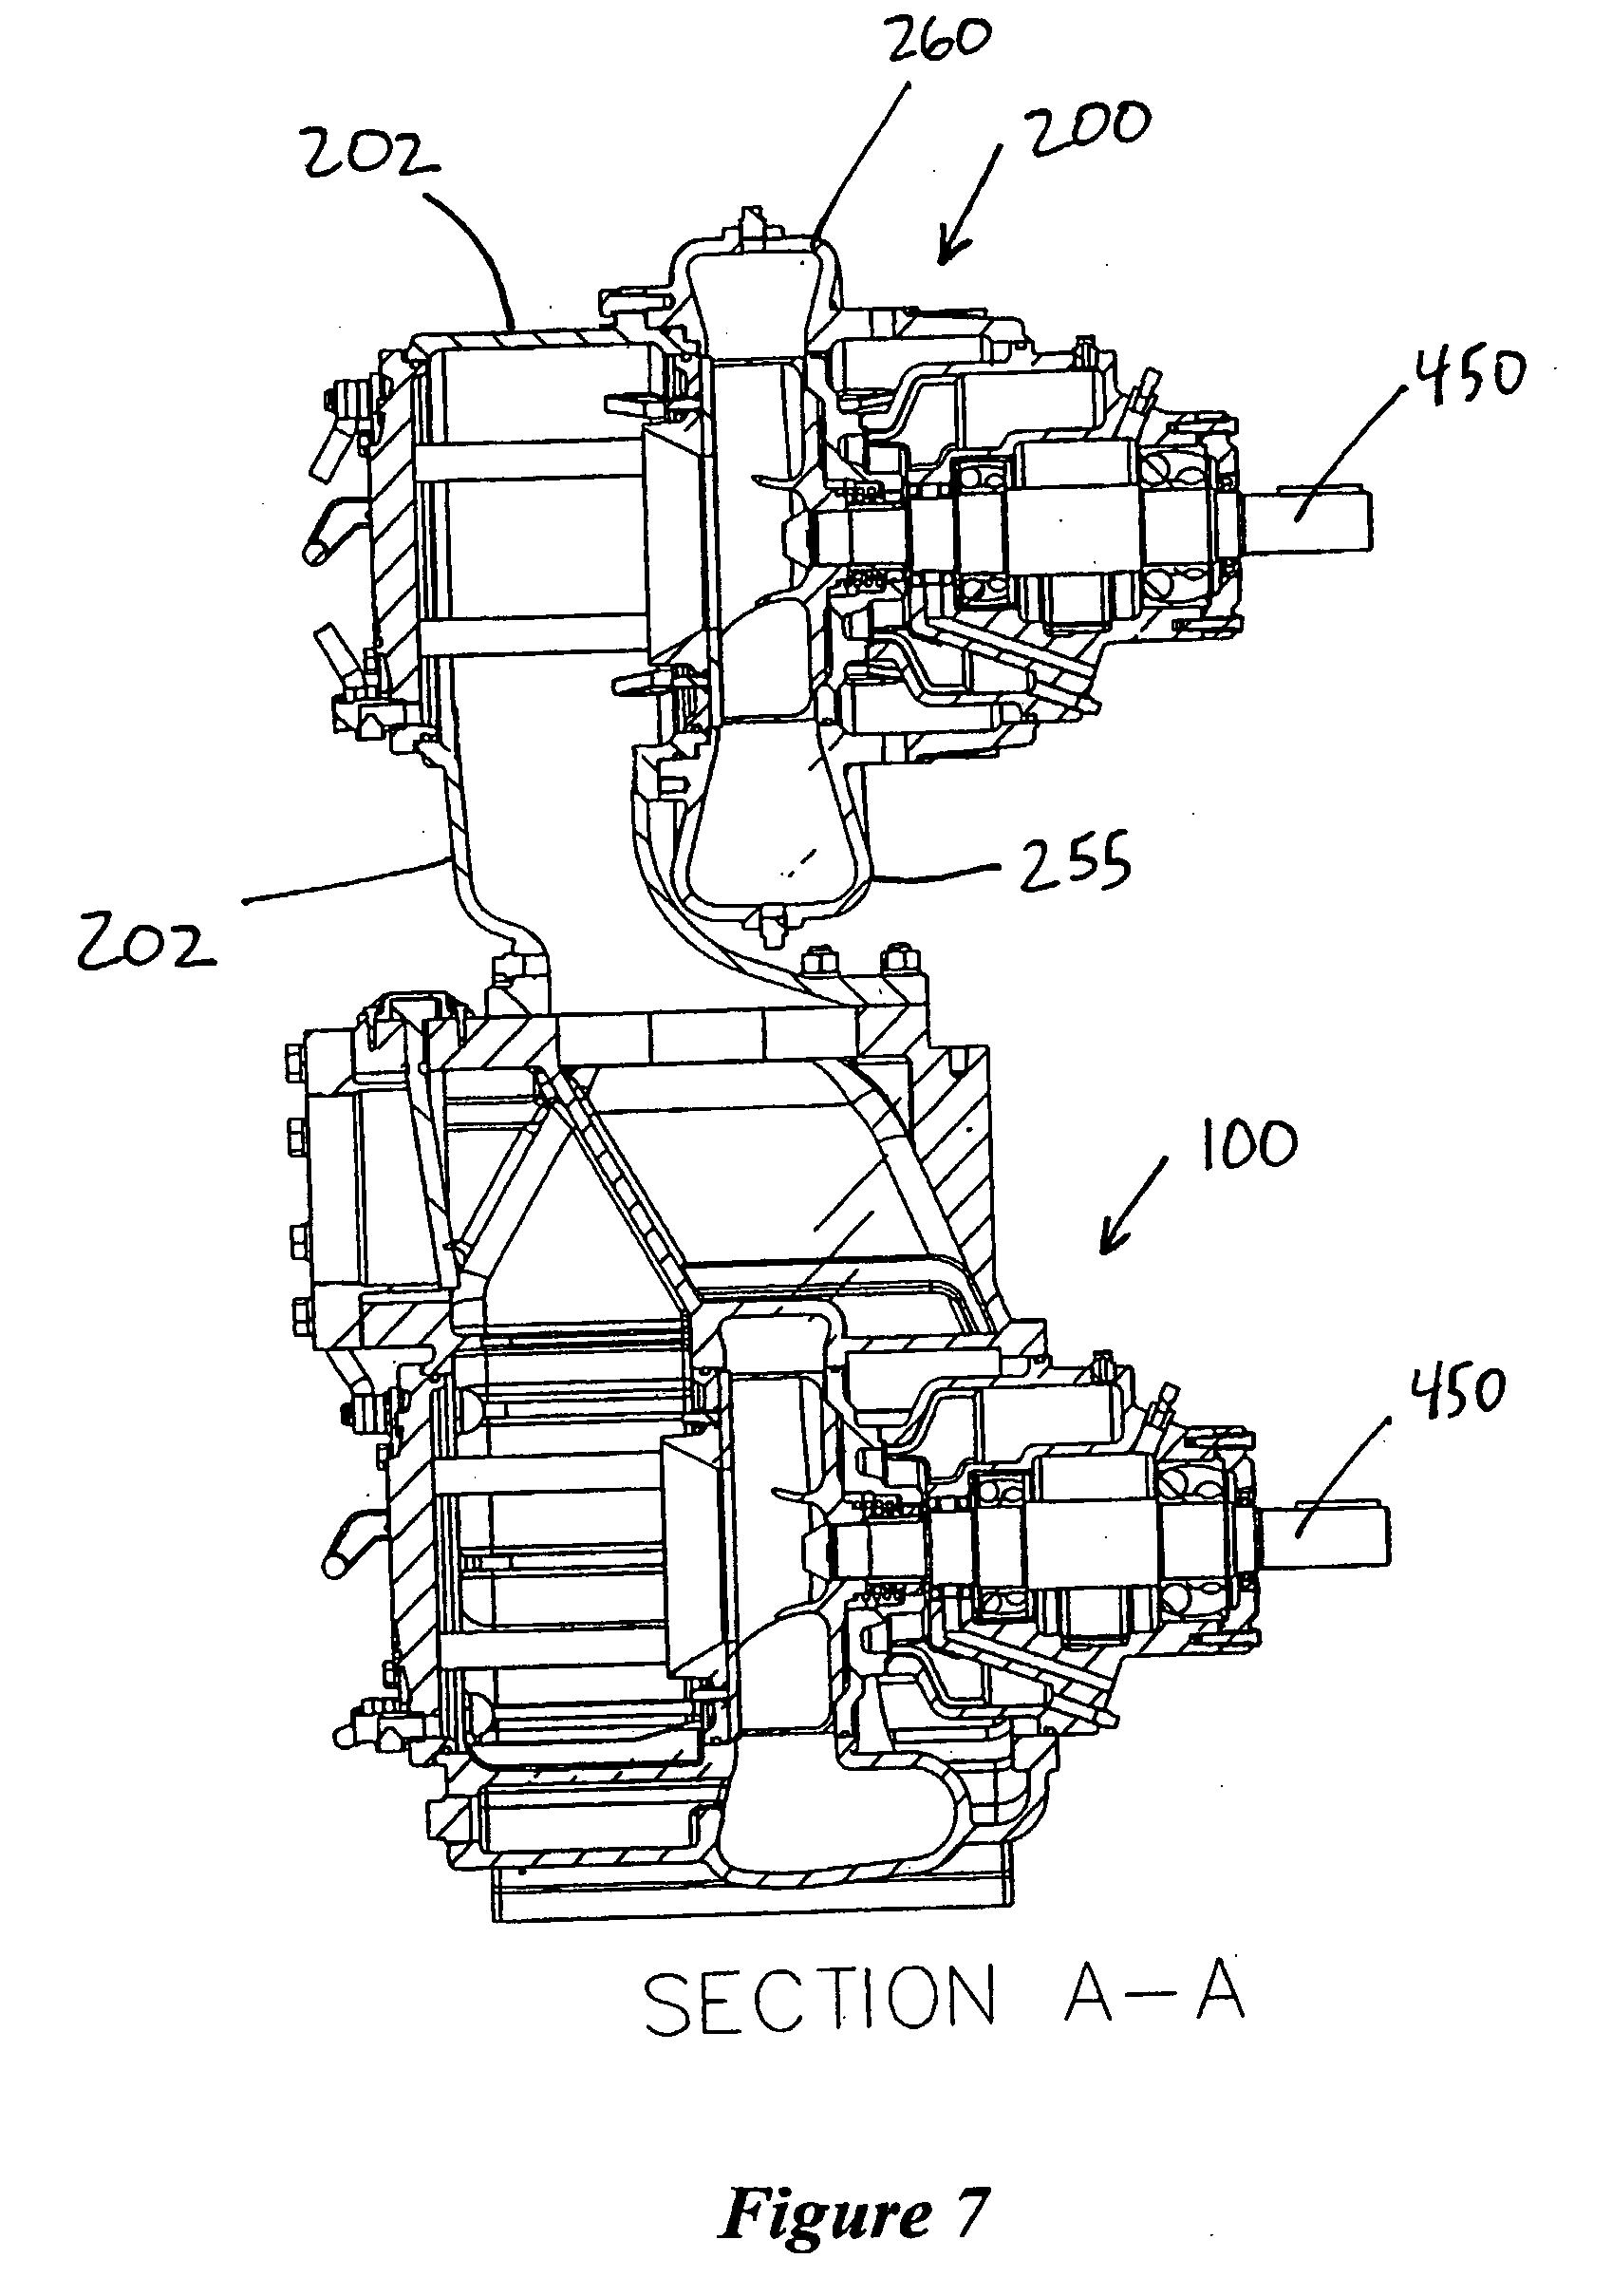 centripro pump control box wiring